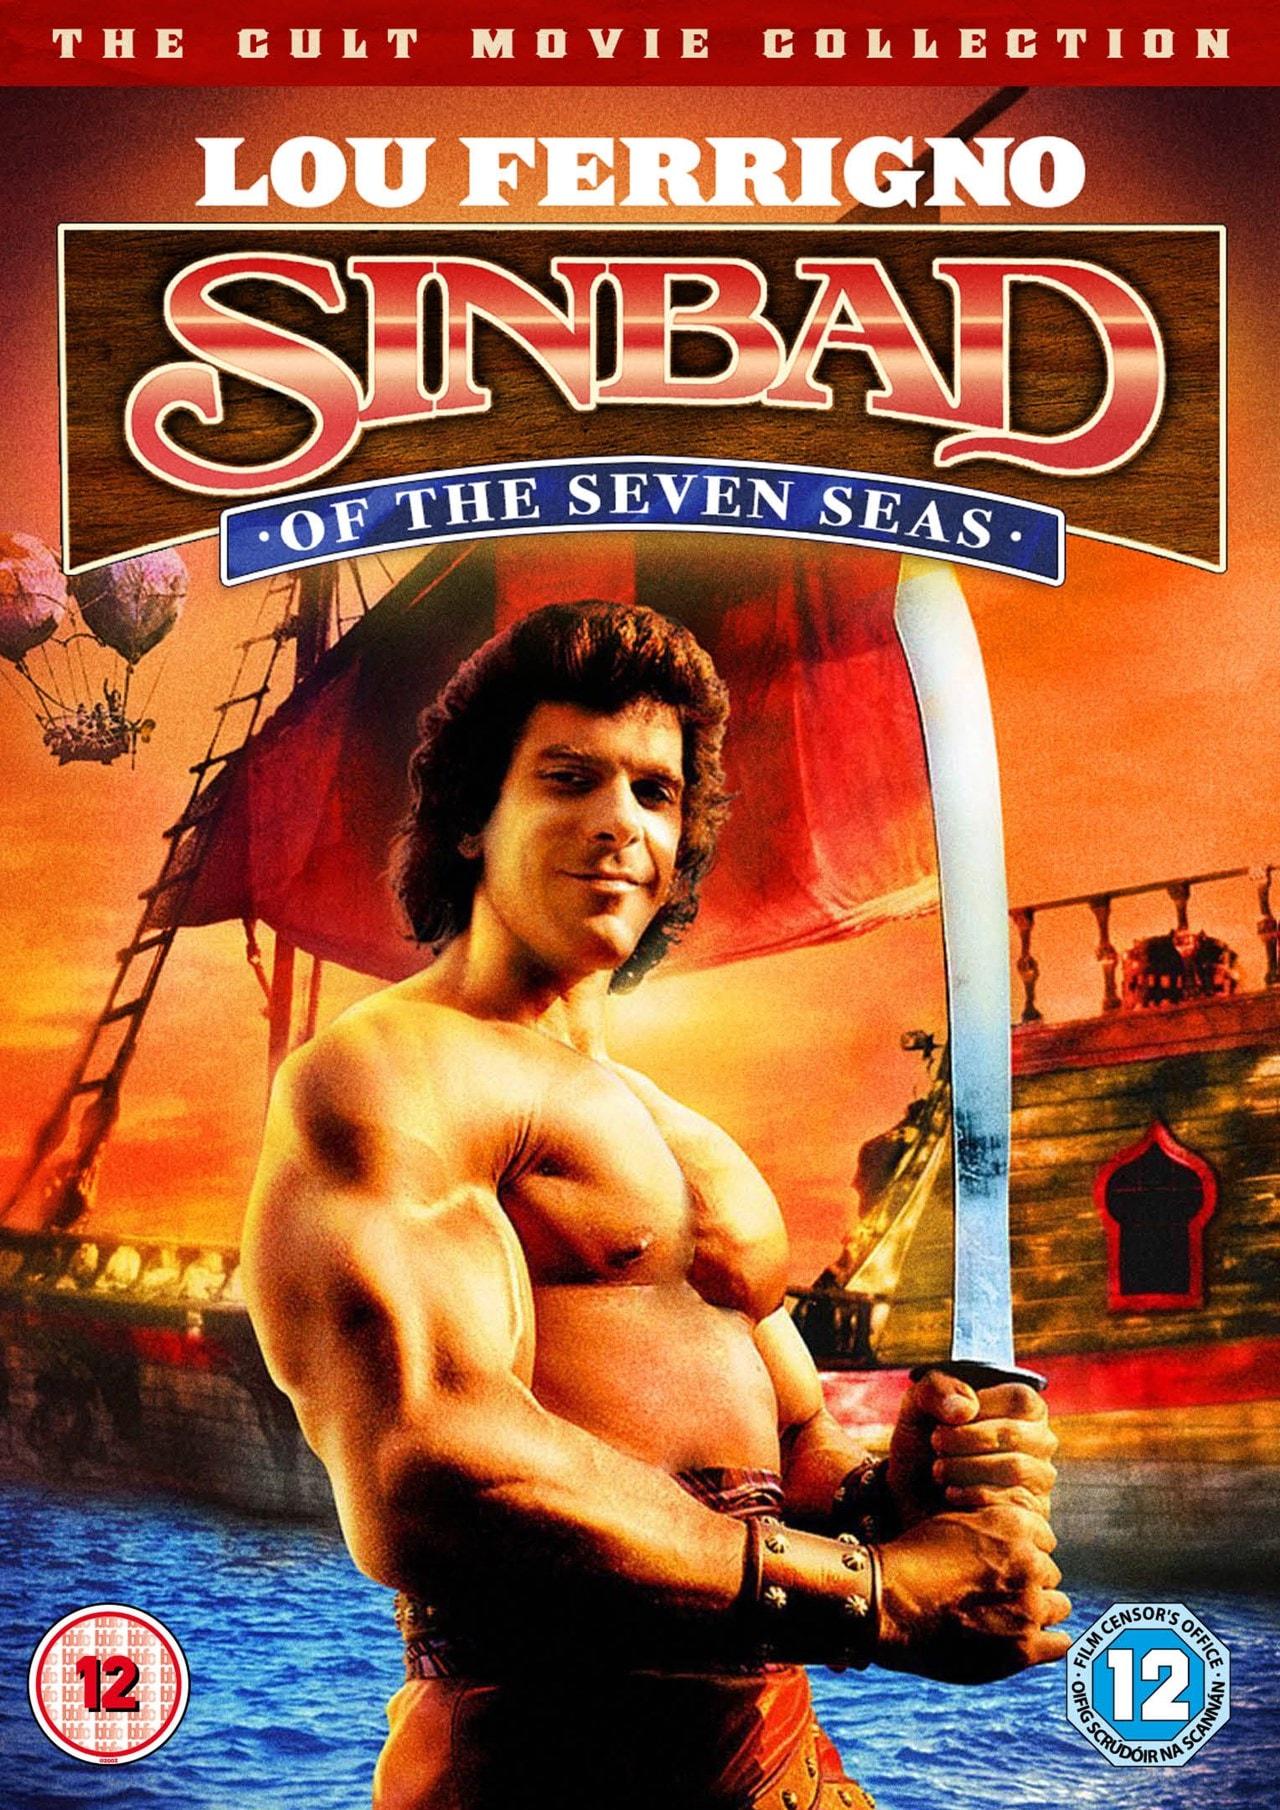 Sinbad of the Seven Seas - 1